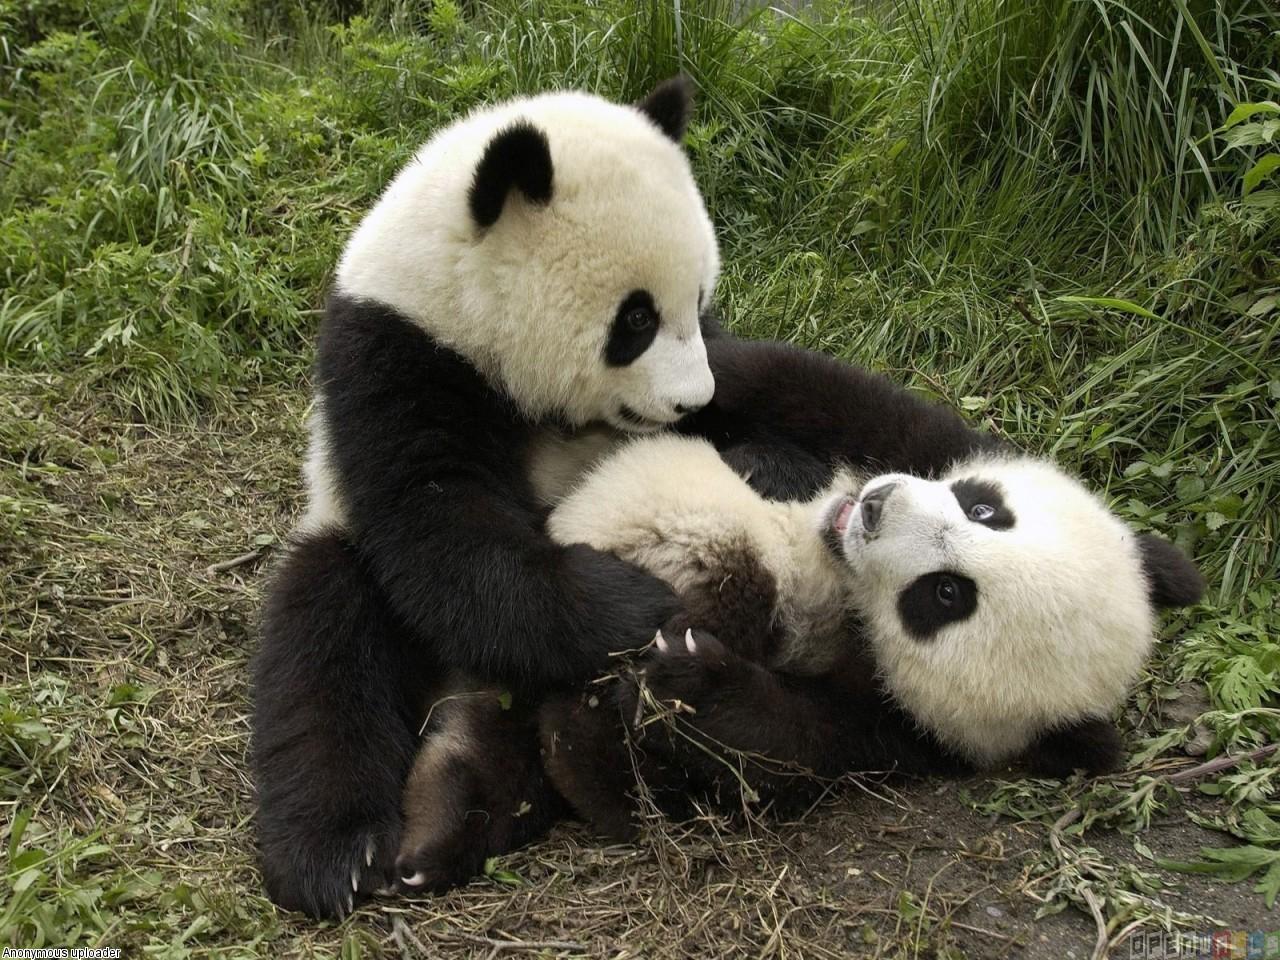 Baby panda bears wallpaper 4557   Open Walls 1280x960